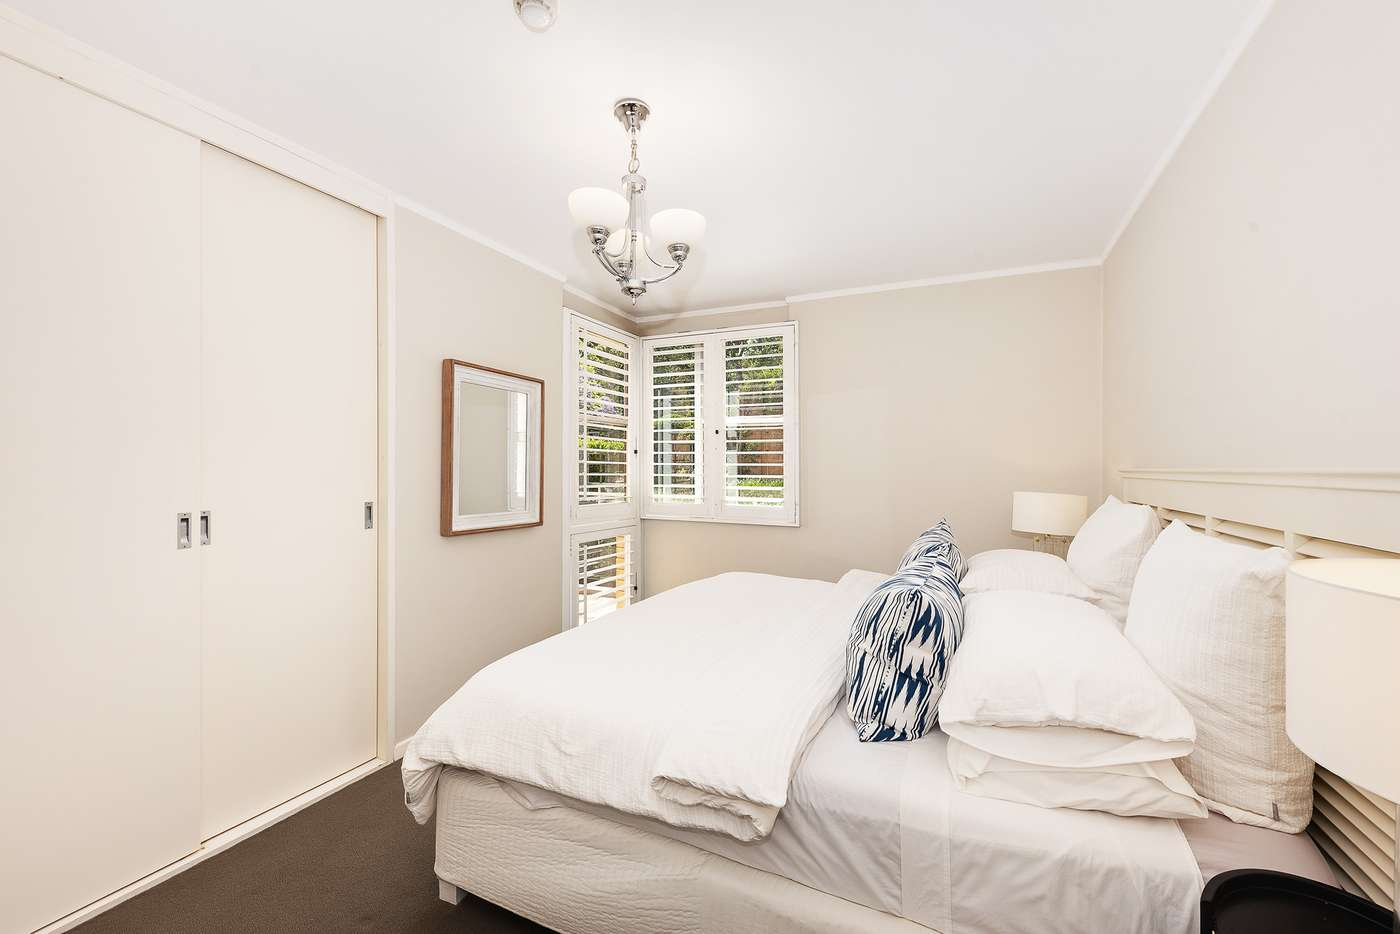 Sixth view of Homely apartment listing, 3/74 Upper Pitt Street, Kirribilli NSW 2061